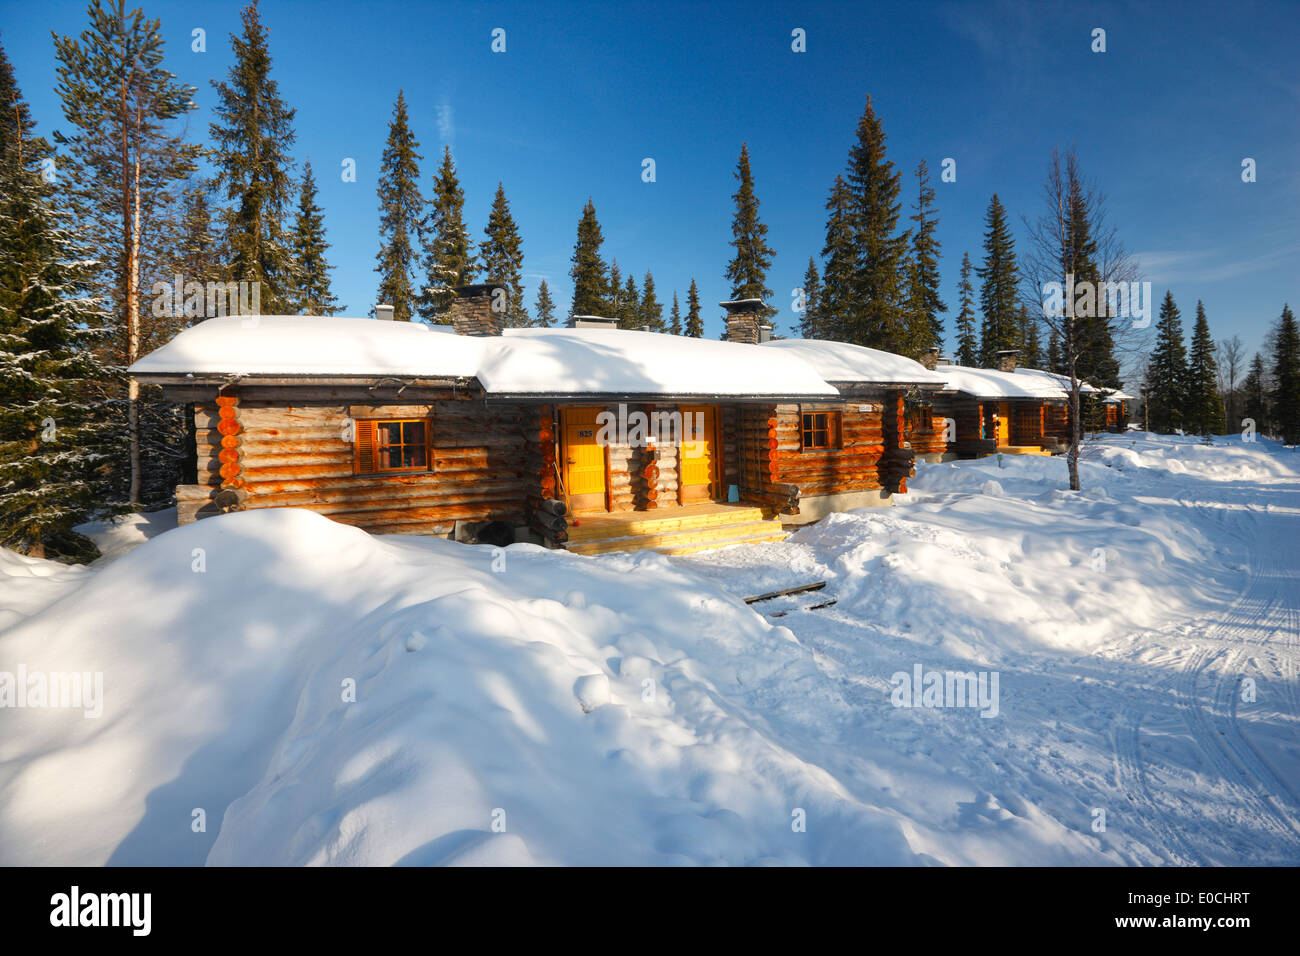 Finland Luosto - Hotel Luostotunturi, Cottage with Sauna. - Stock Image